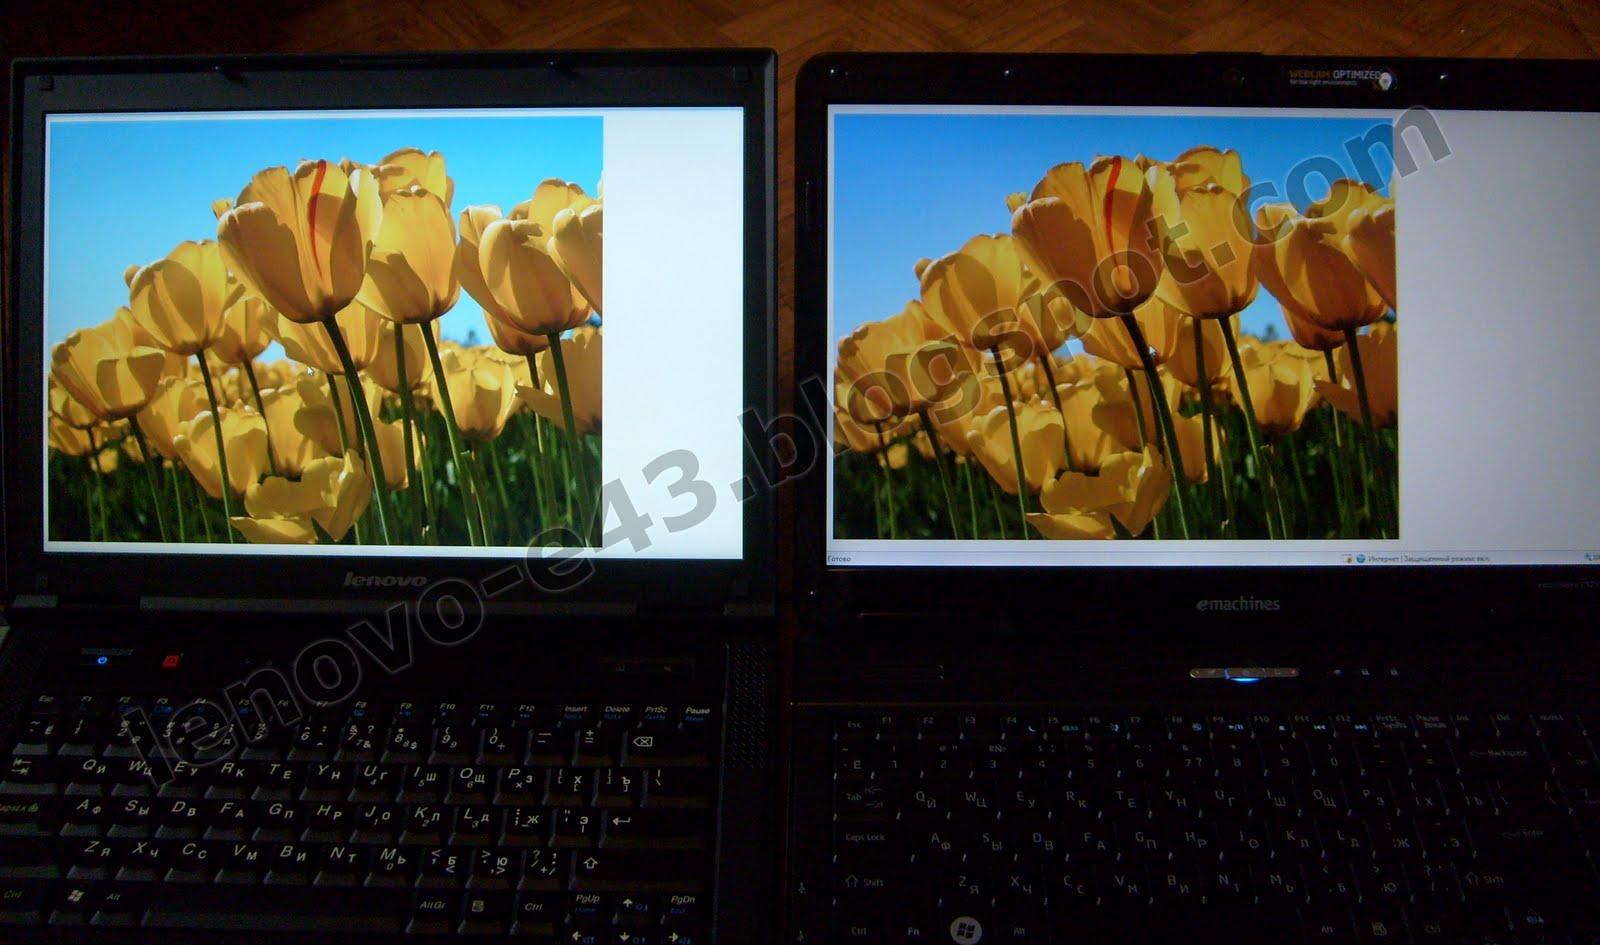 Сравнение ноутбуков acer emachines e525